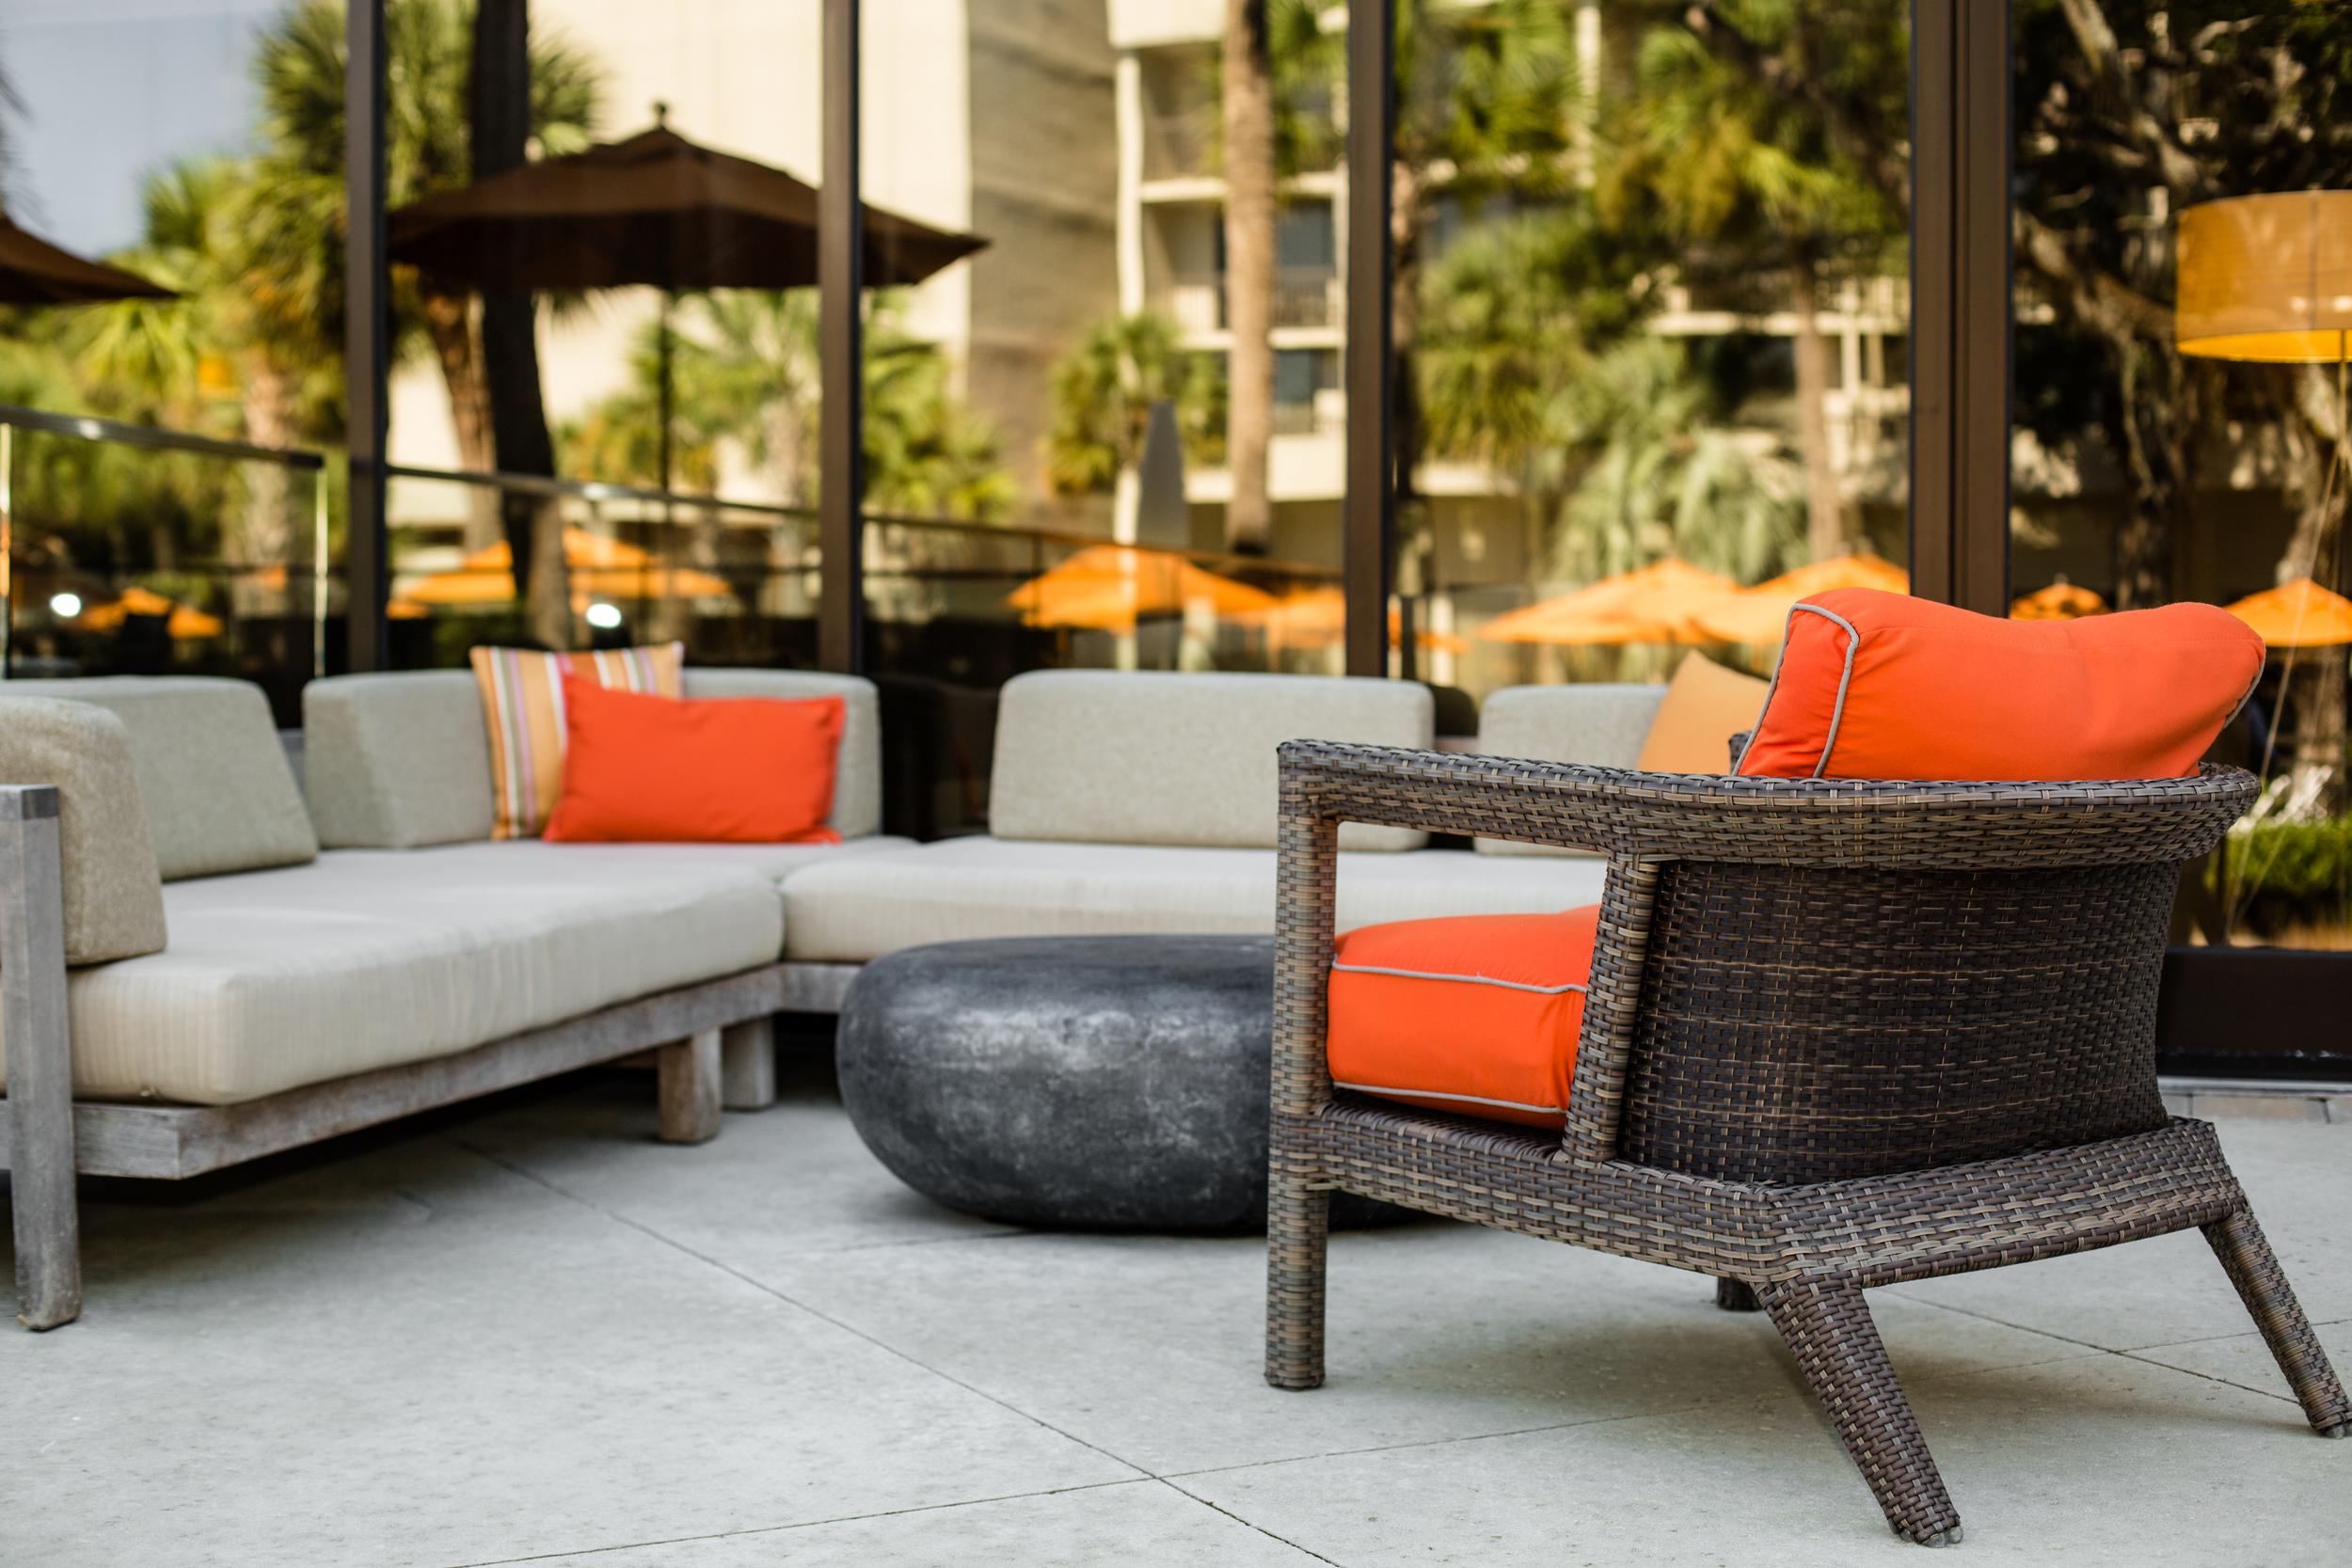 Outdoor Seating at Beach Resort, Hilton Head Island